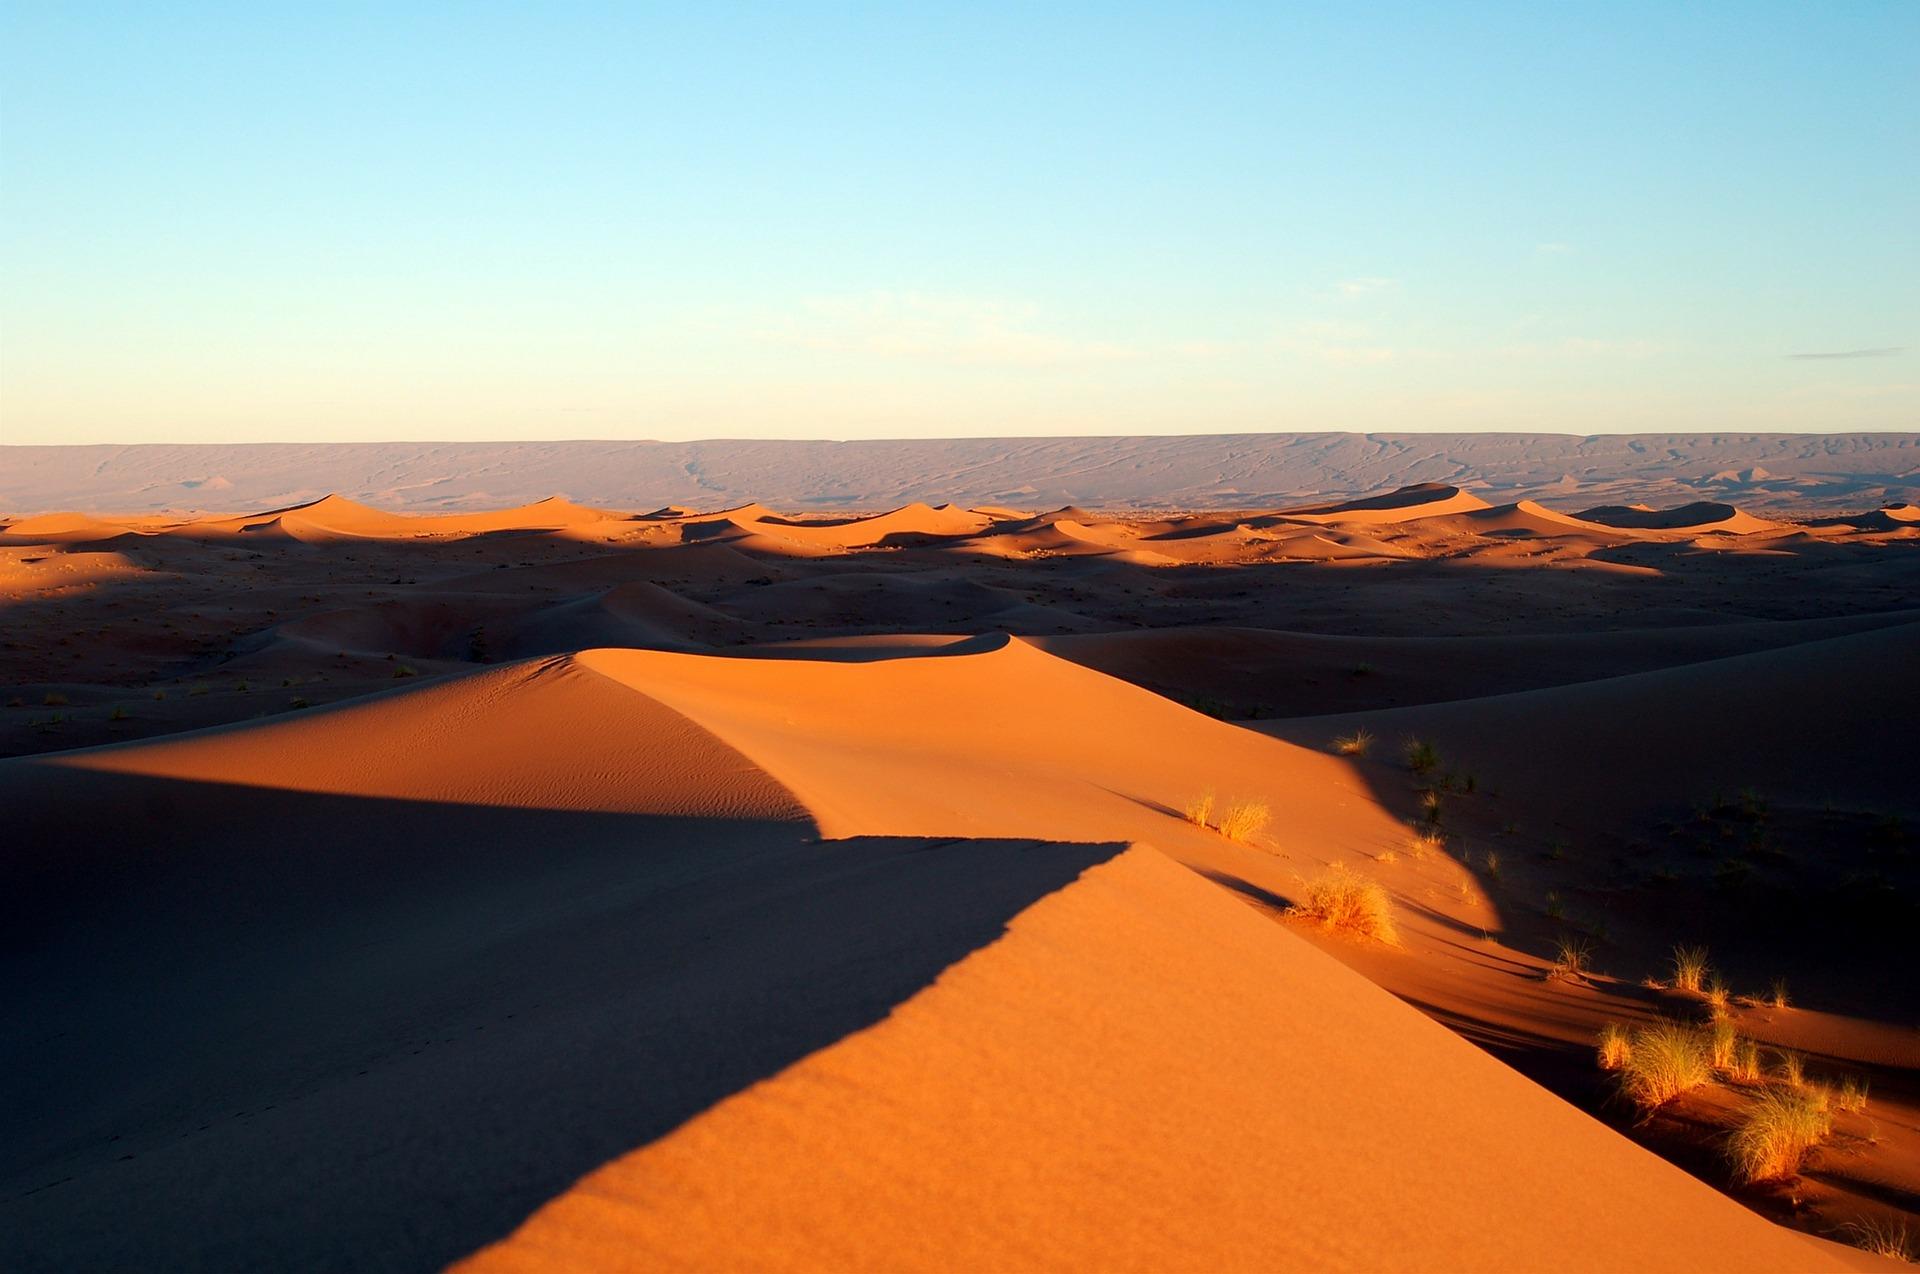 morocco-123976_1920